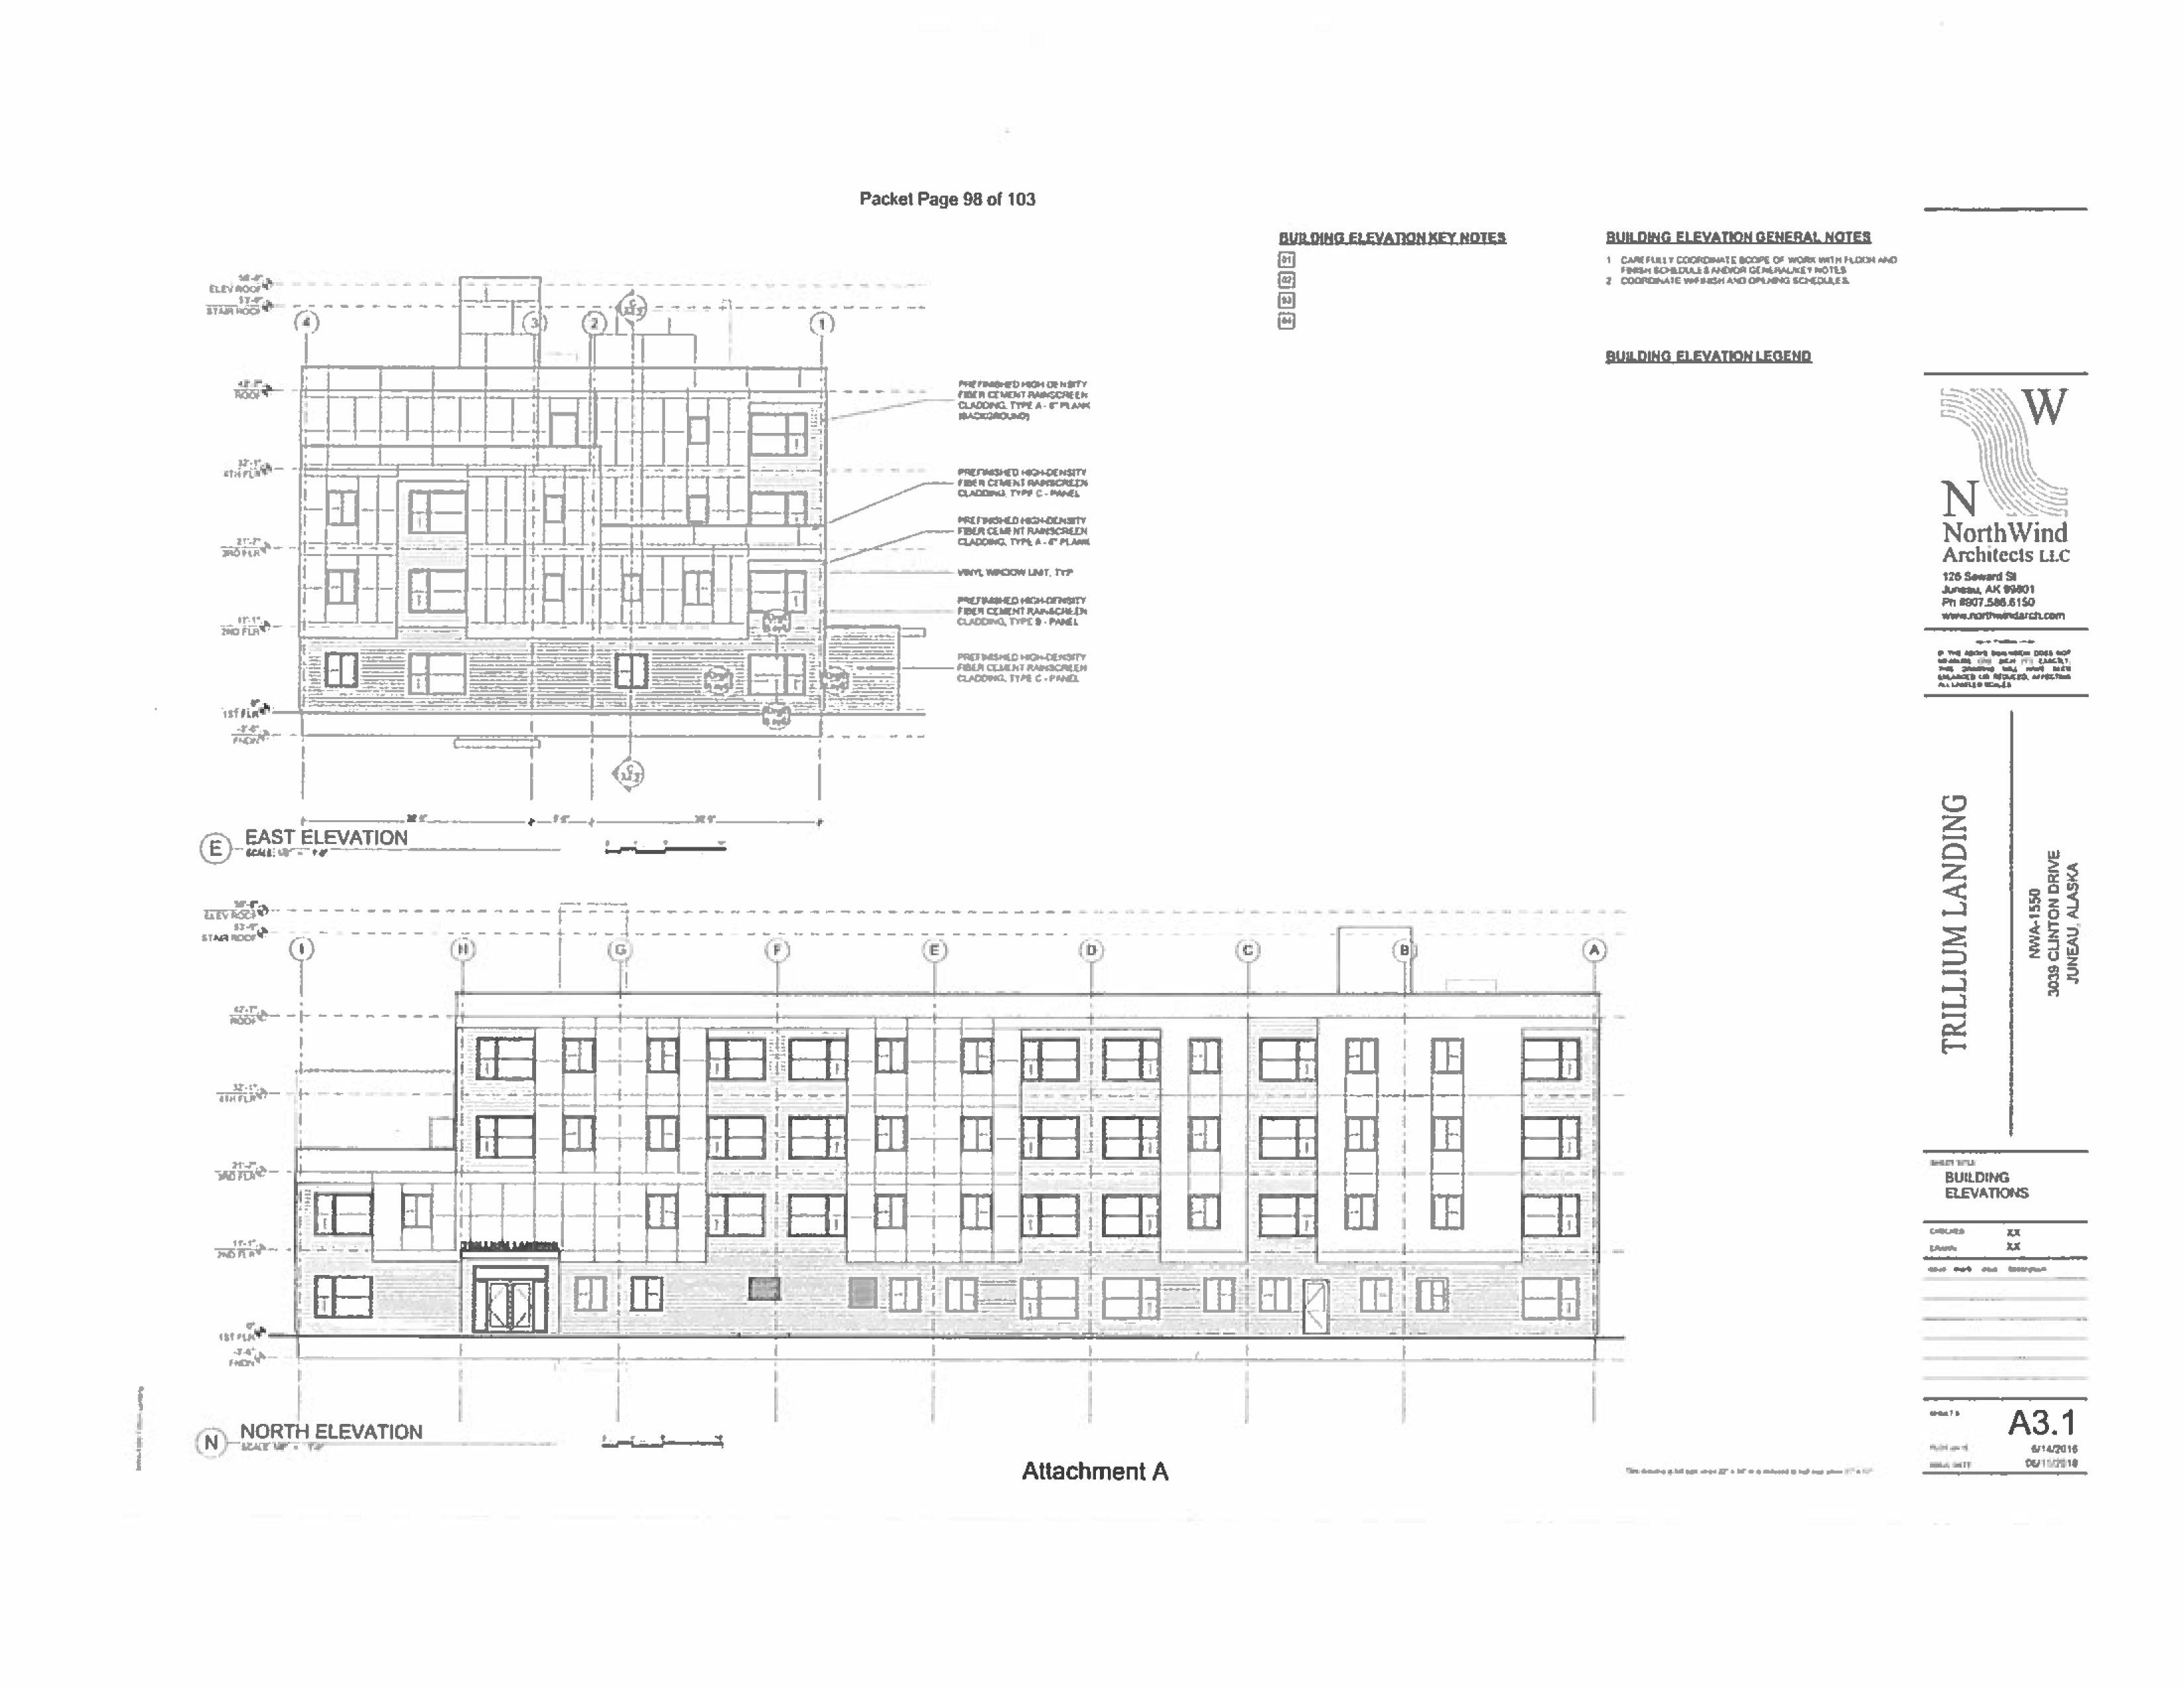 Yanmar Wiring Diagram 140 Free Download Wiring Diagram Schematic